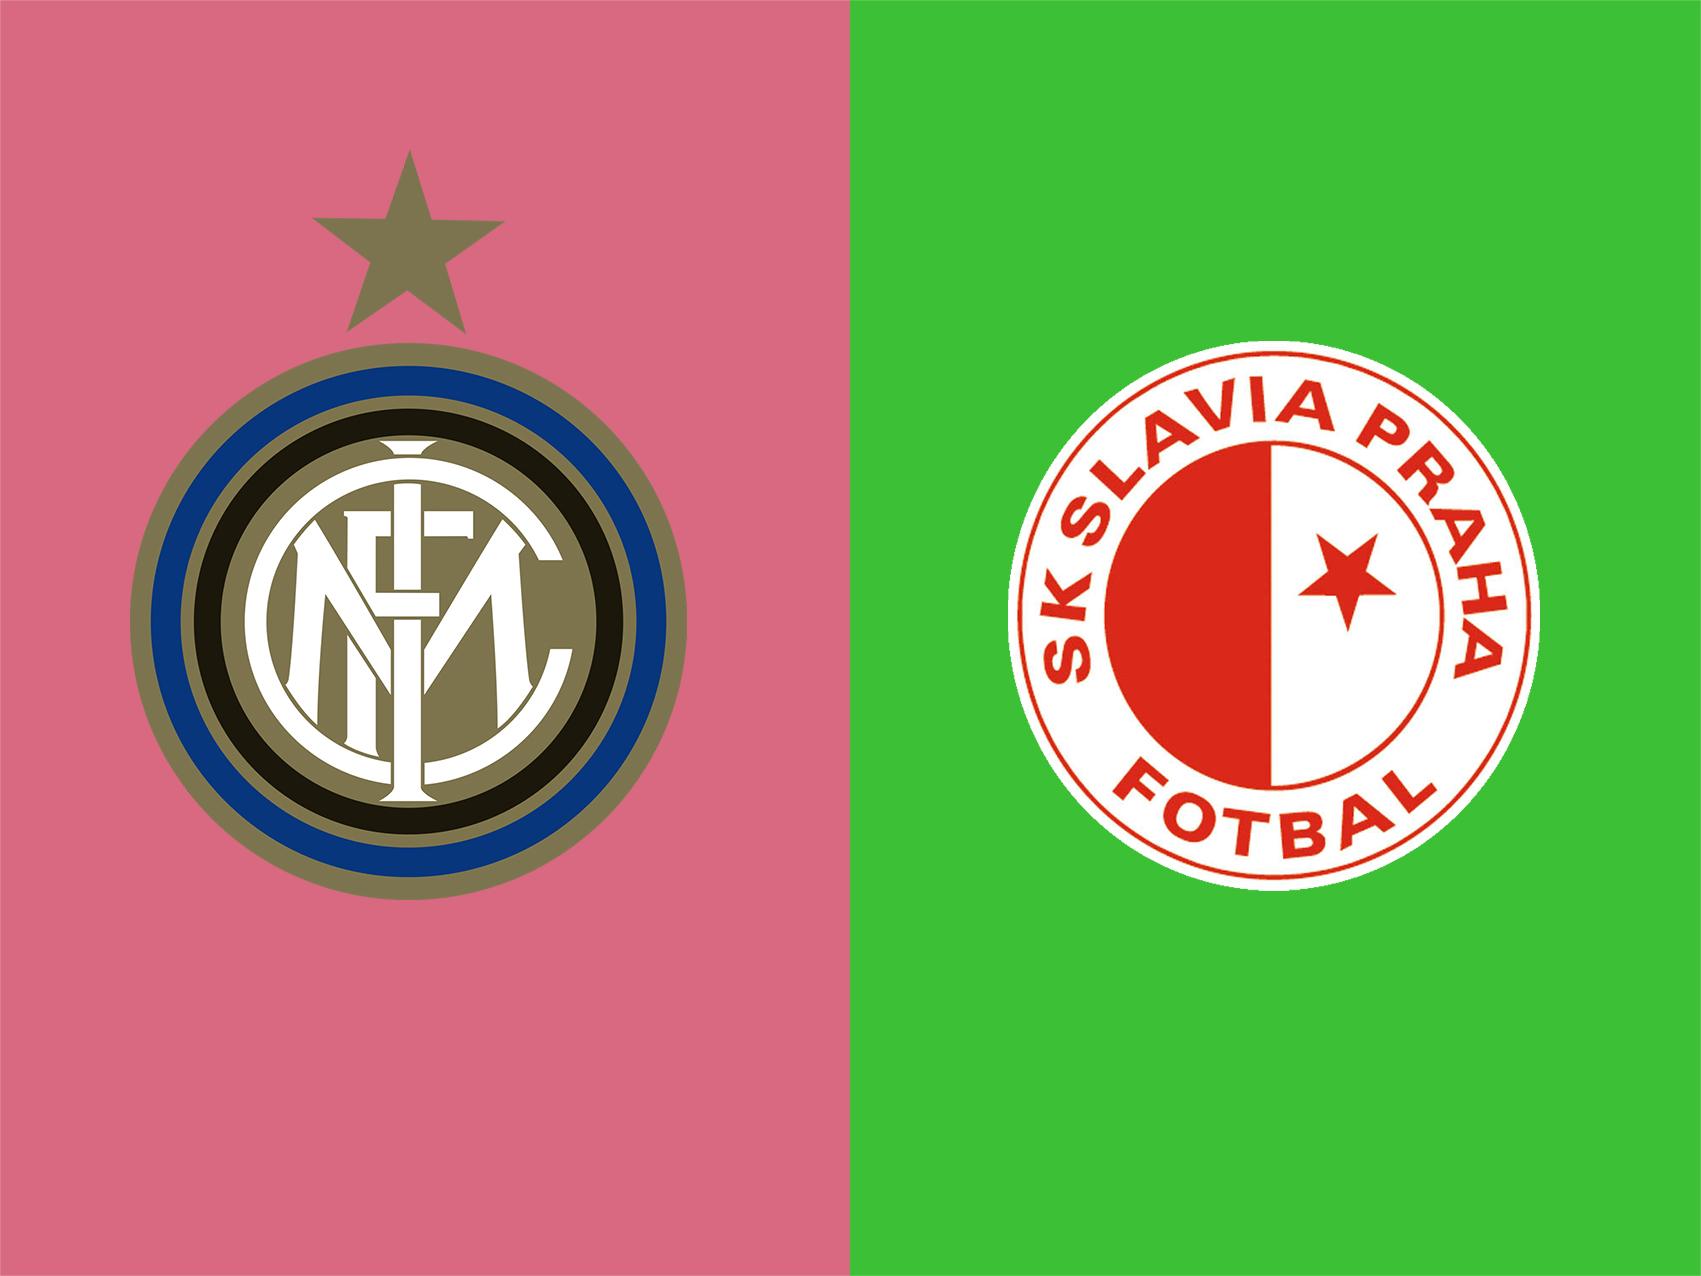 soi-keo-ca-cuoc-bong-da-ngay-14-9-Inter Milan-vs-Slavia Praha-do-it-thang-do-nhieu-b9